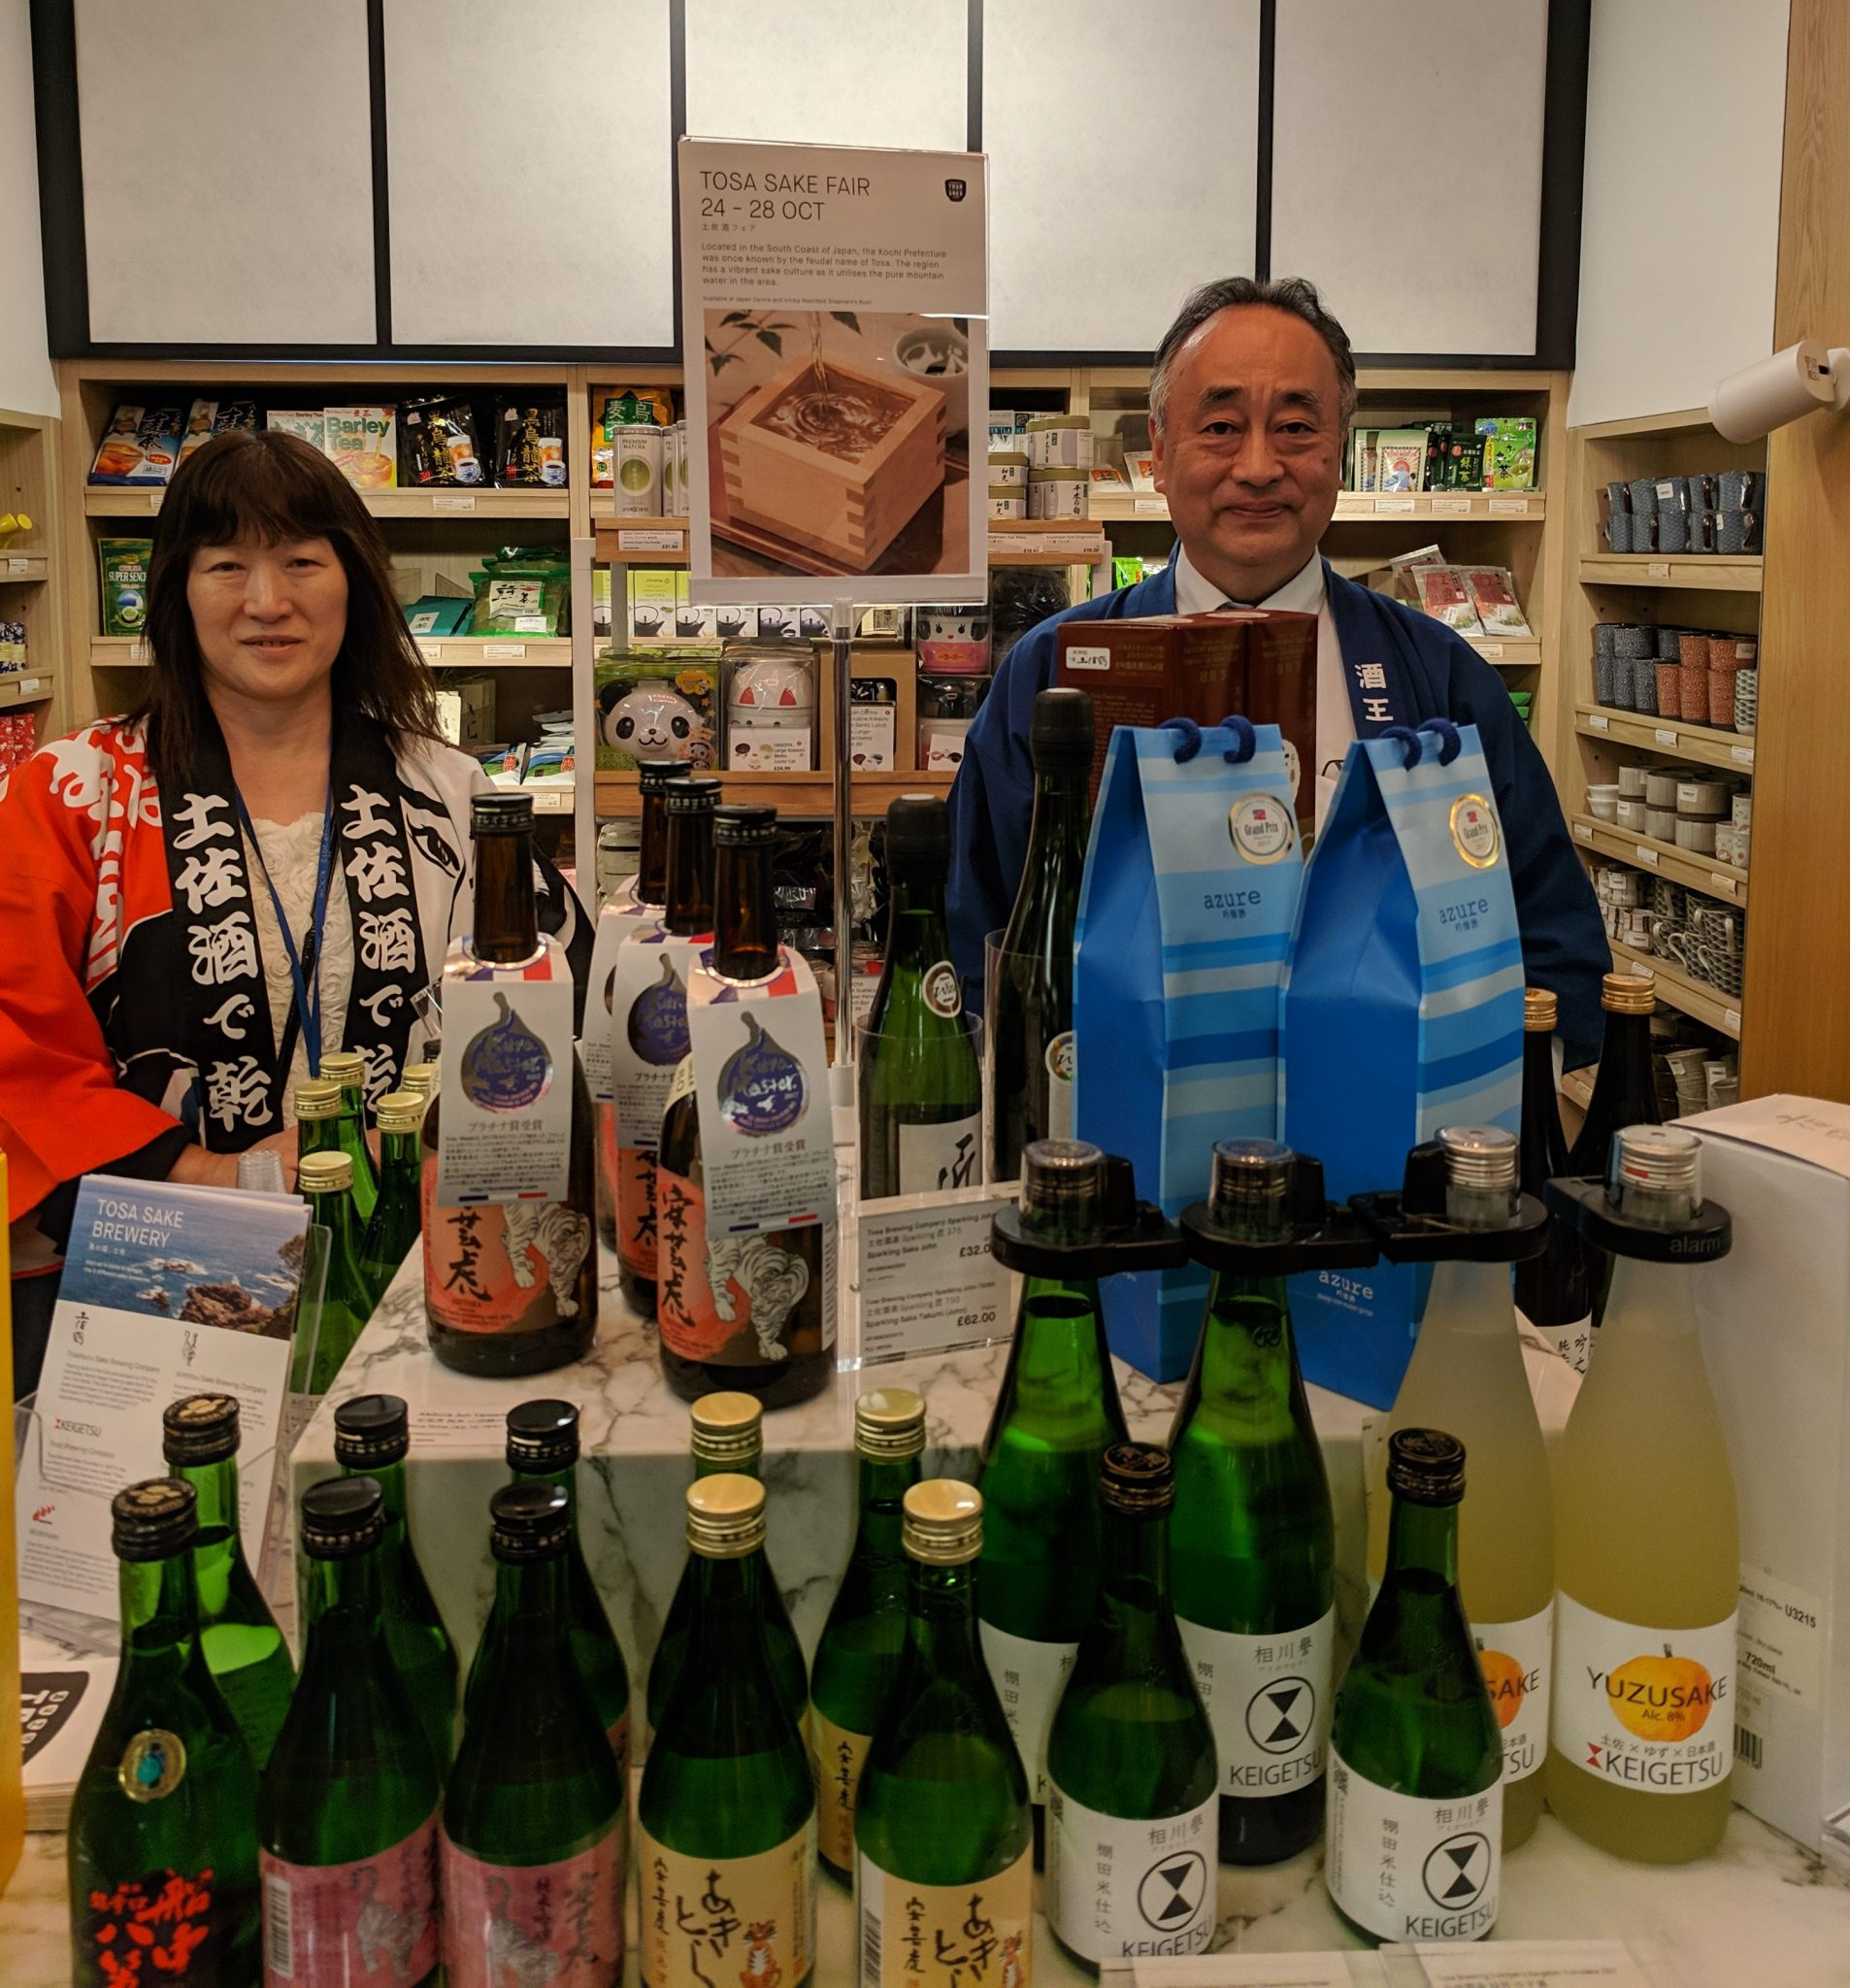 Tosa Sake Fair